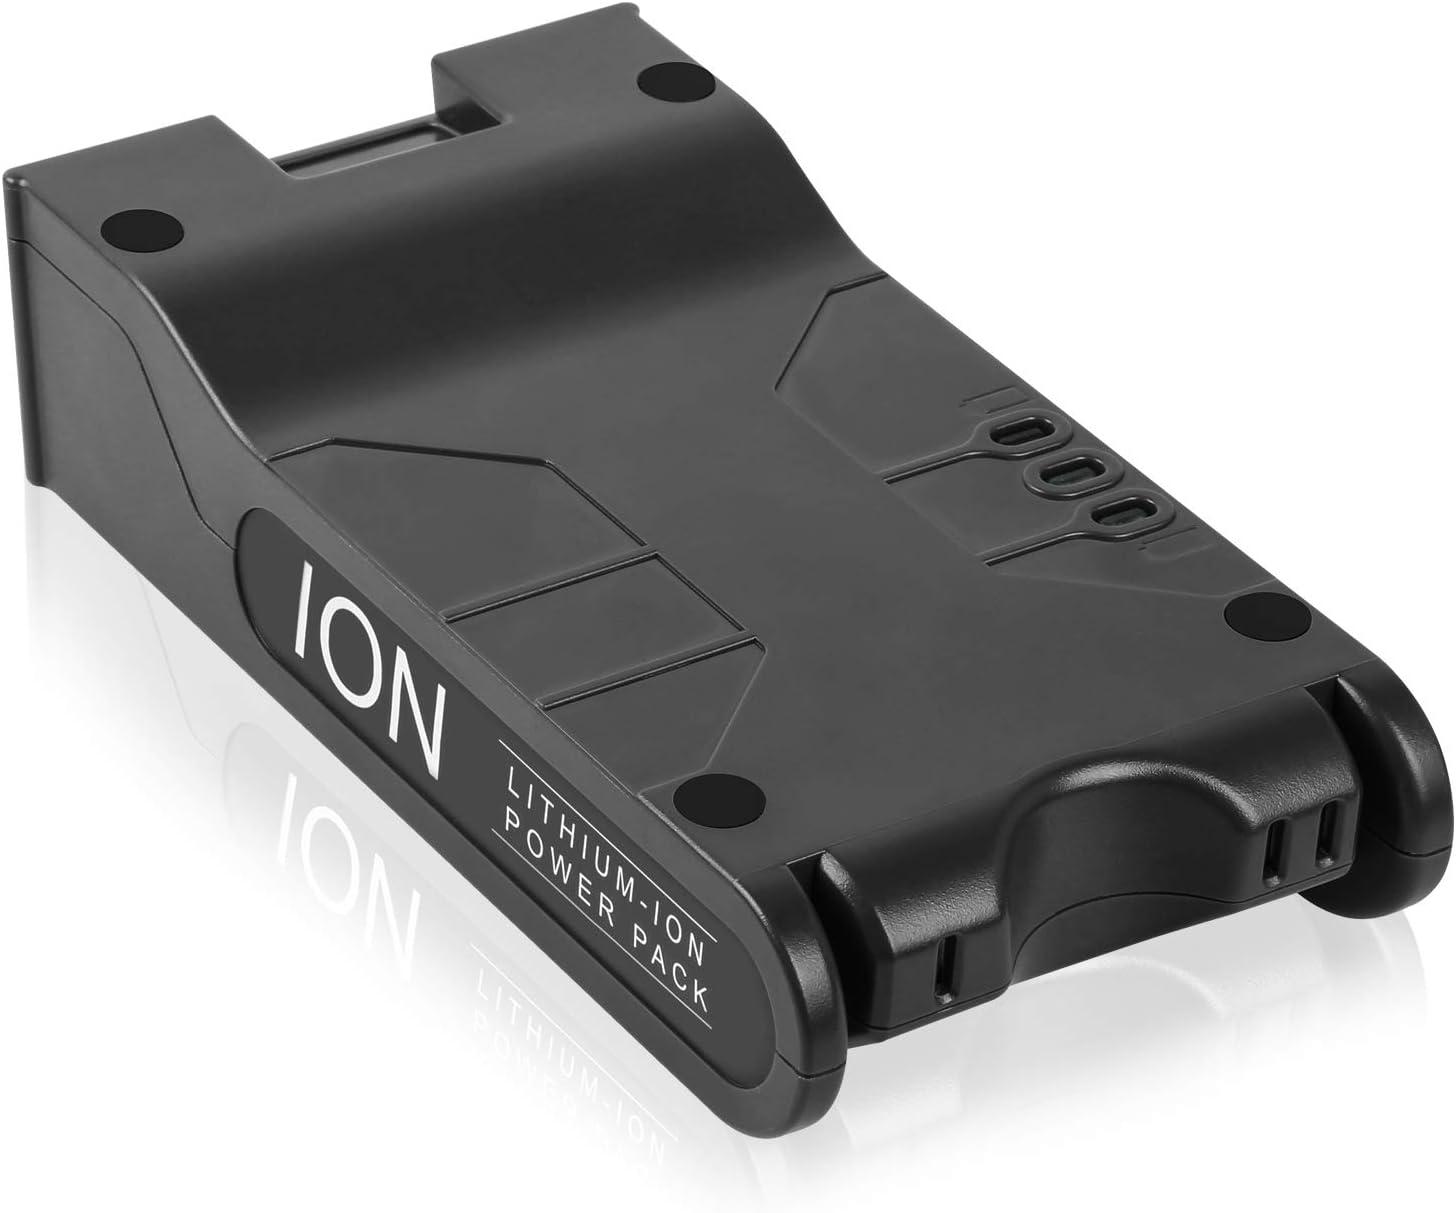 Amityke XBAT200 Battery Compatible with 25.2V 2450mAh 人気ショップが最安値挑戦 ION Shark 国内正規総代理店アイテム